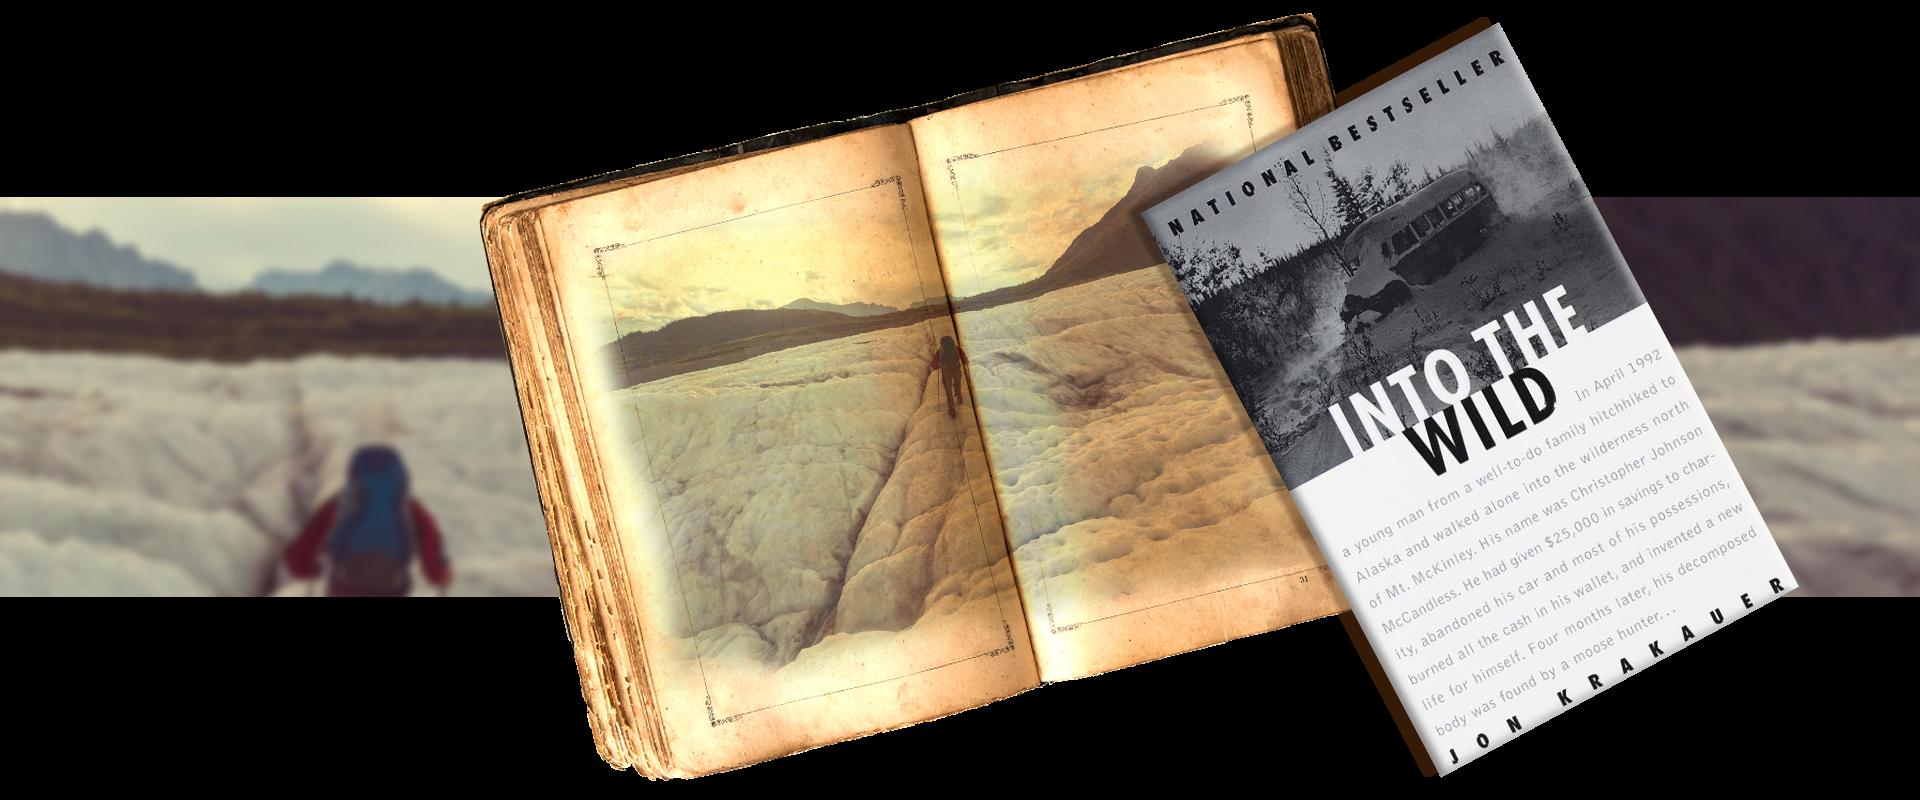 Into the wild by Jon Krakauer - vintage book - traveler into Alaskan wilderness